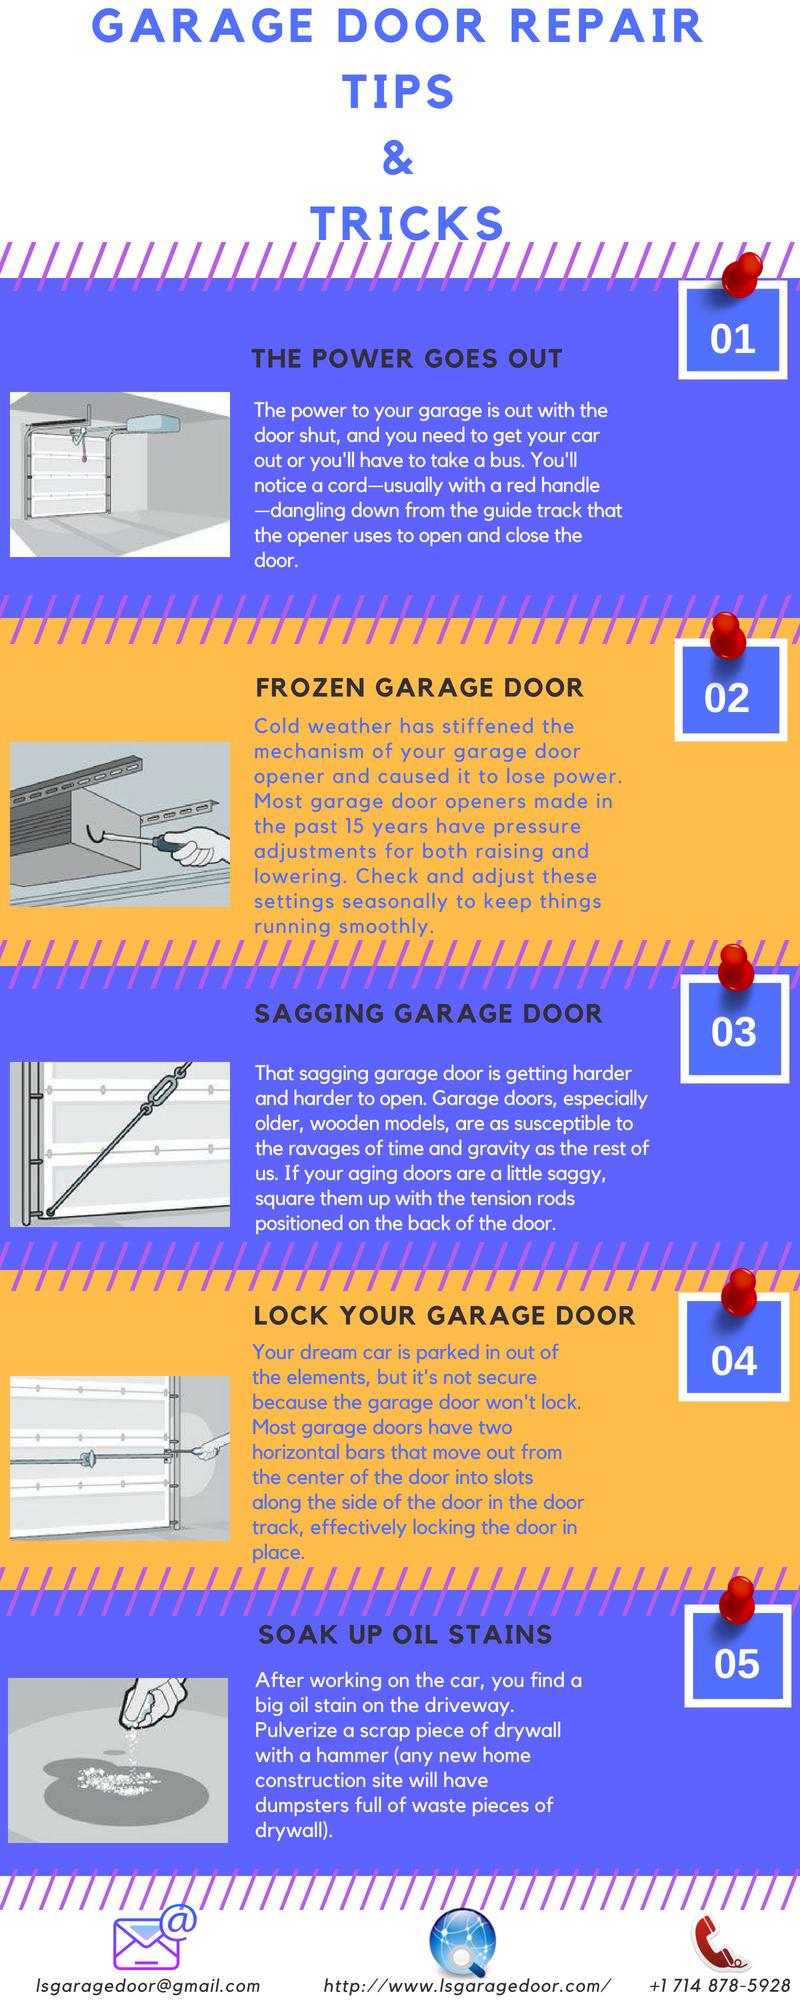 Garage Door Repair Is An Obvious Job To Every Home Owner Repairing